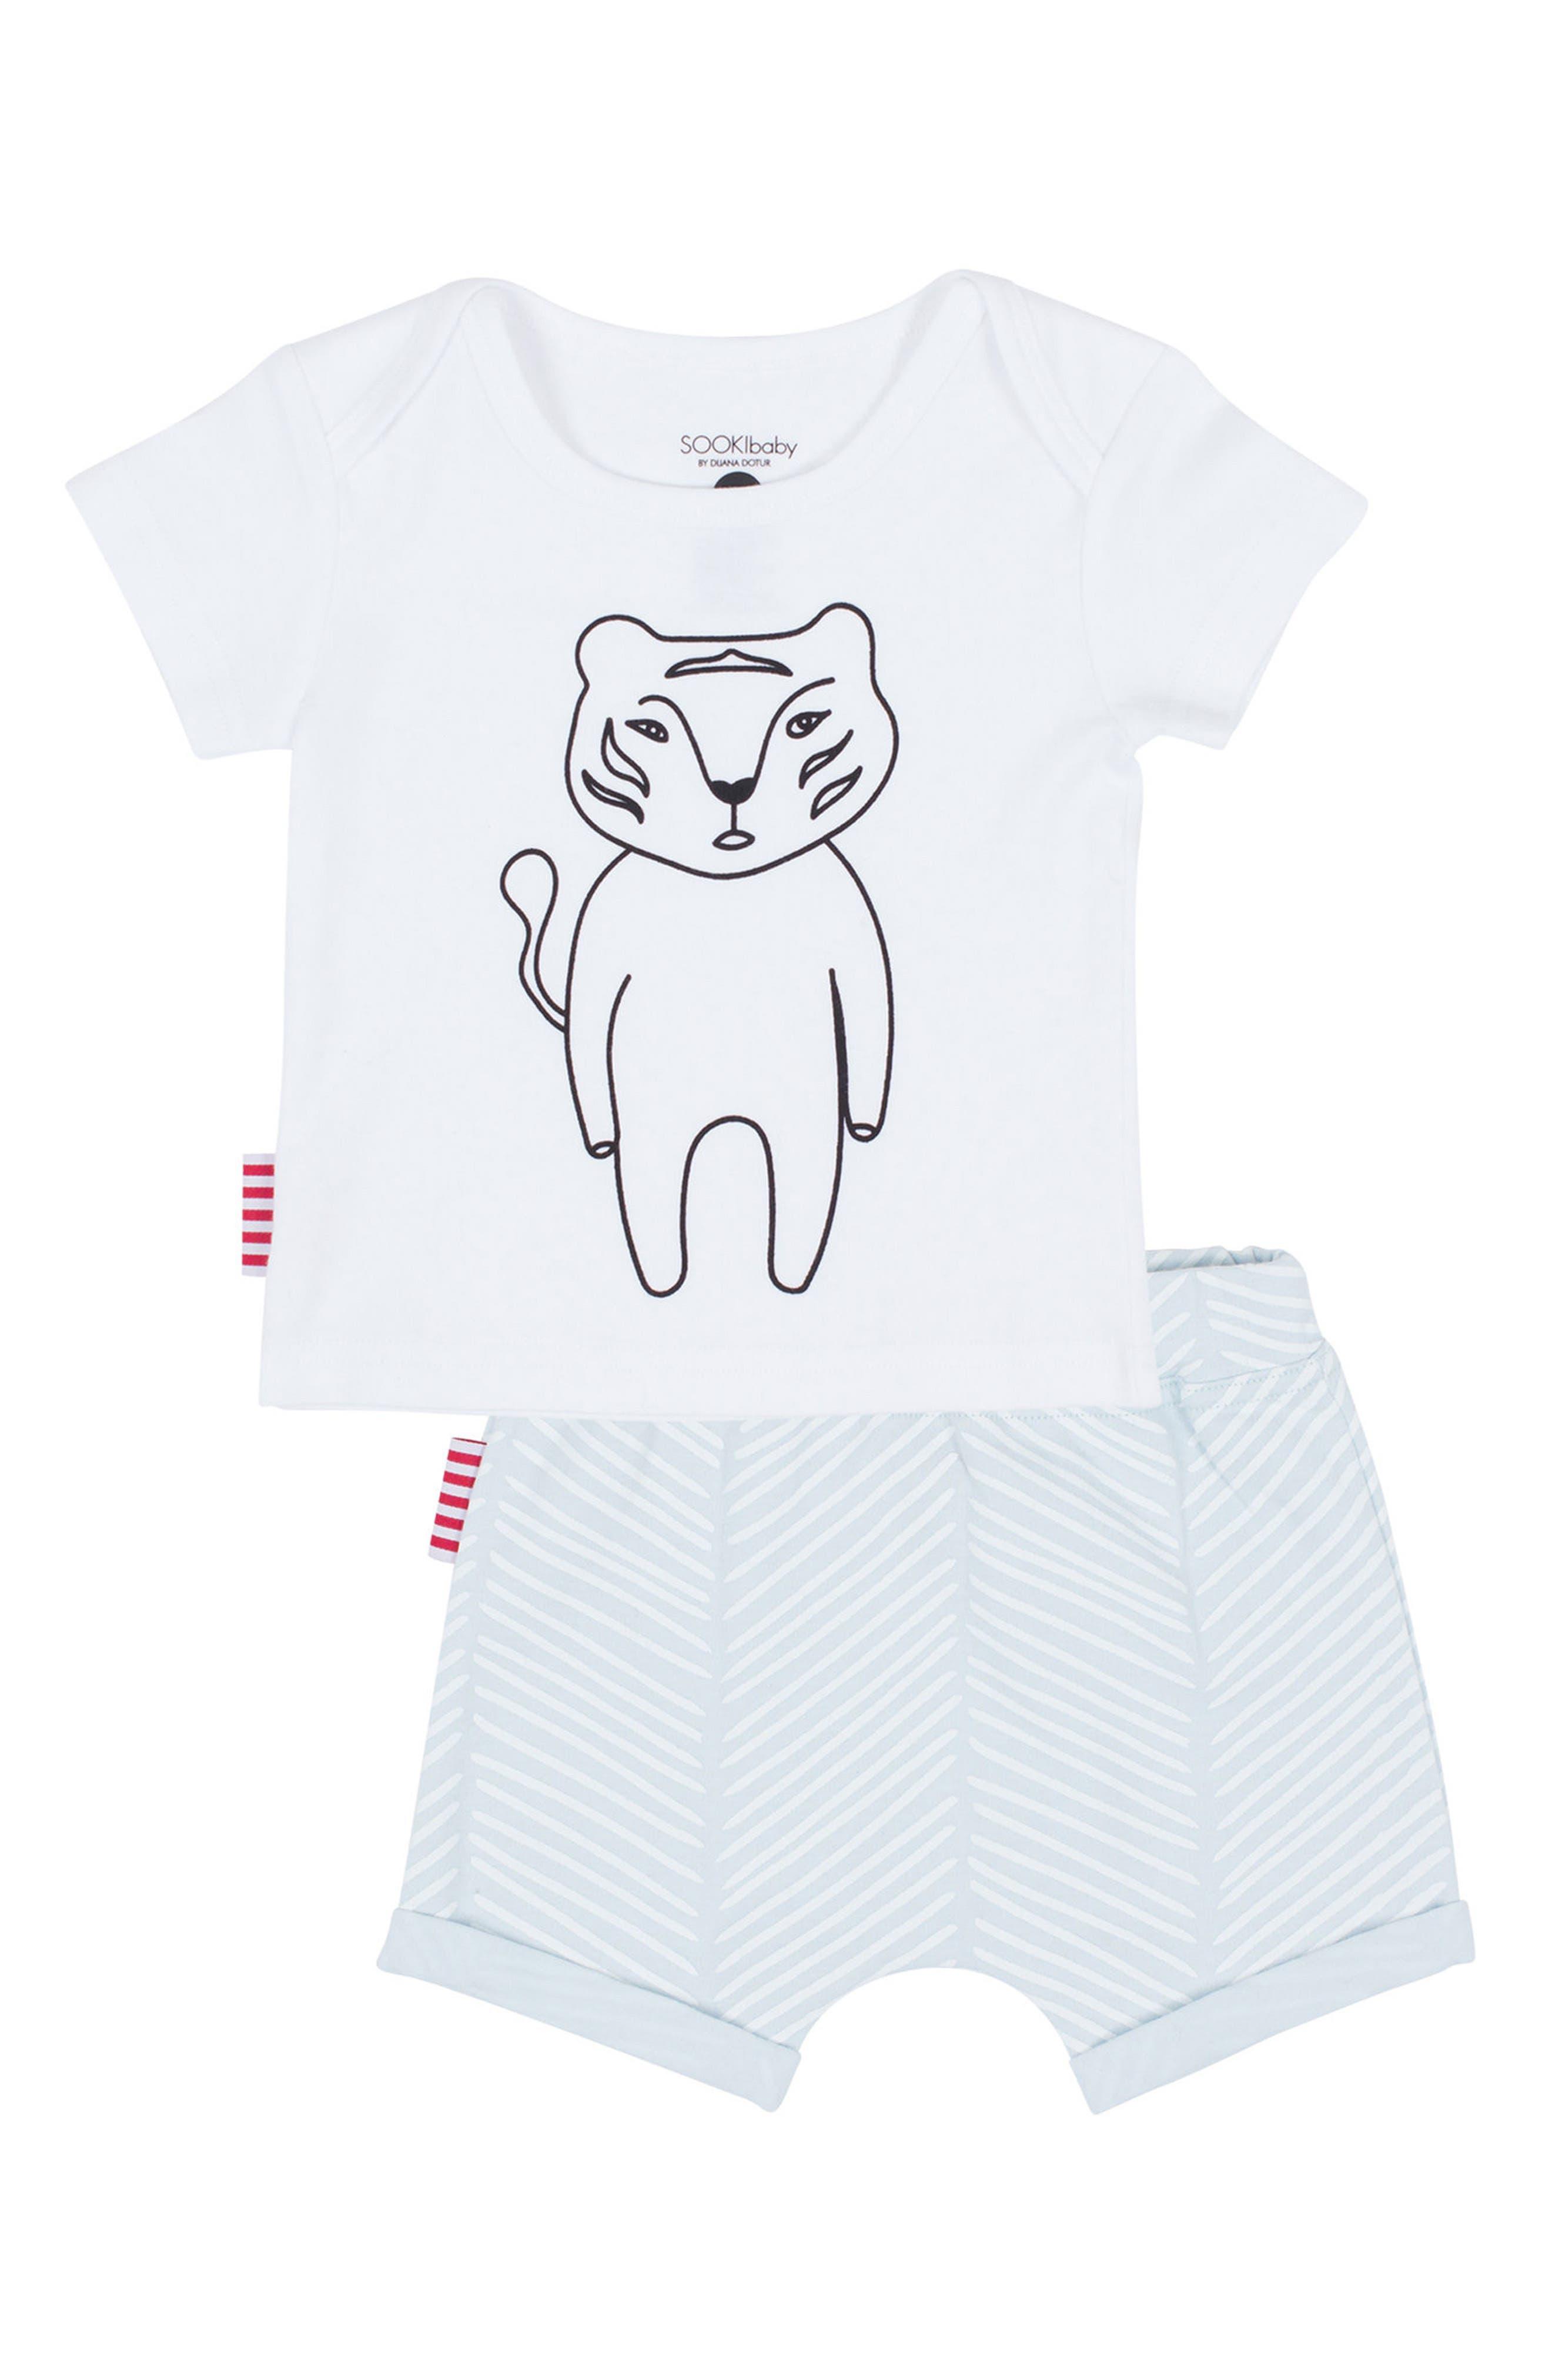 SOOKIbaby Tee & Shorts Set (Baby)